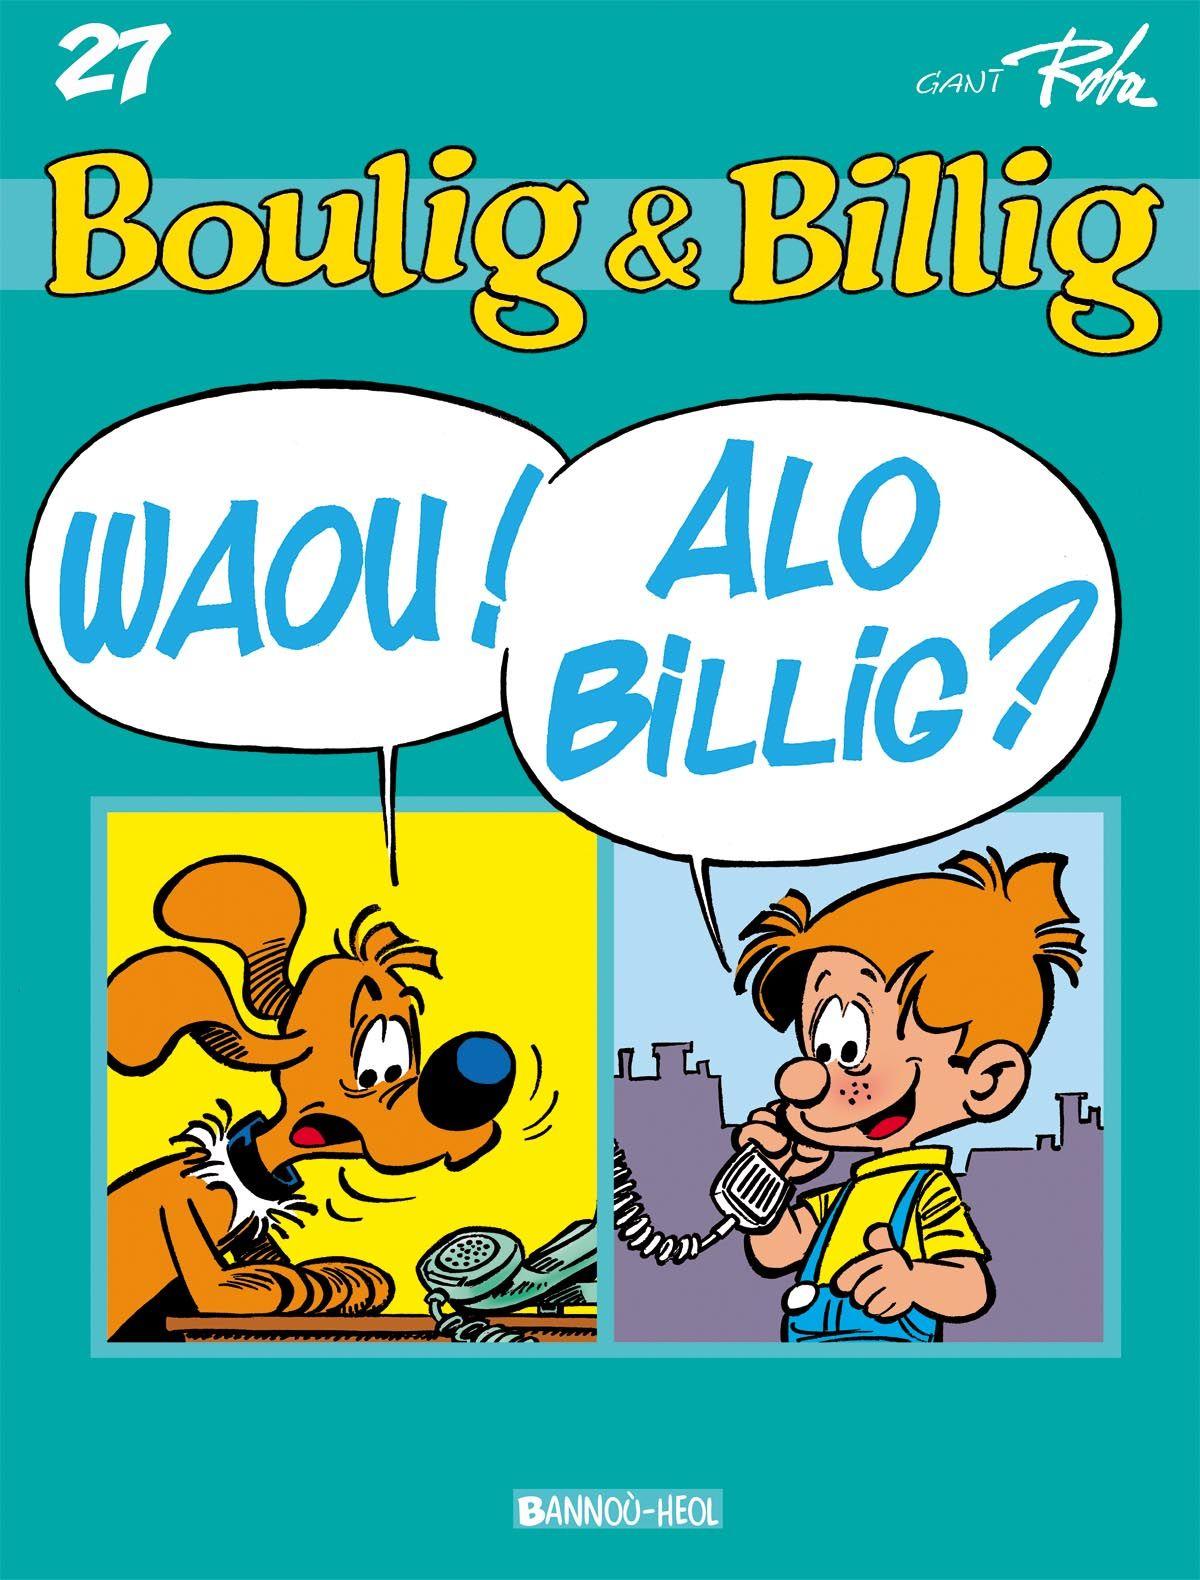 Waou ! Alo Billig ?